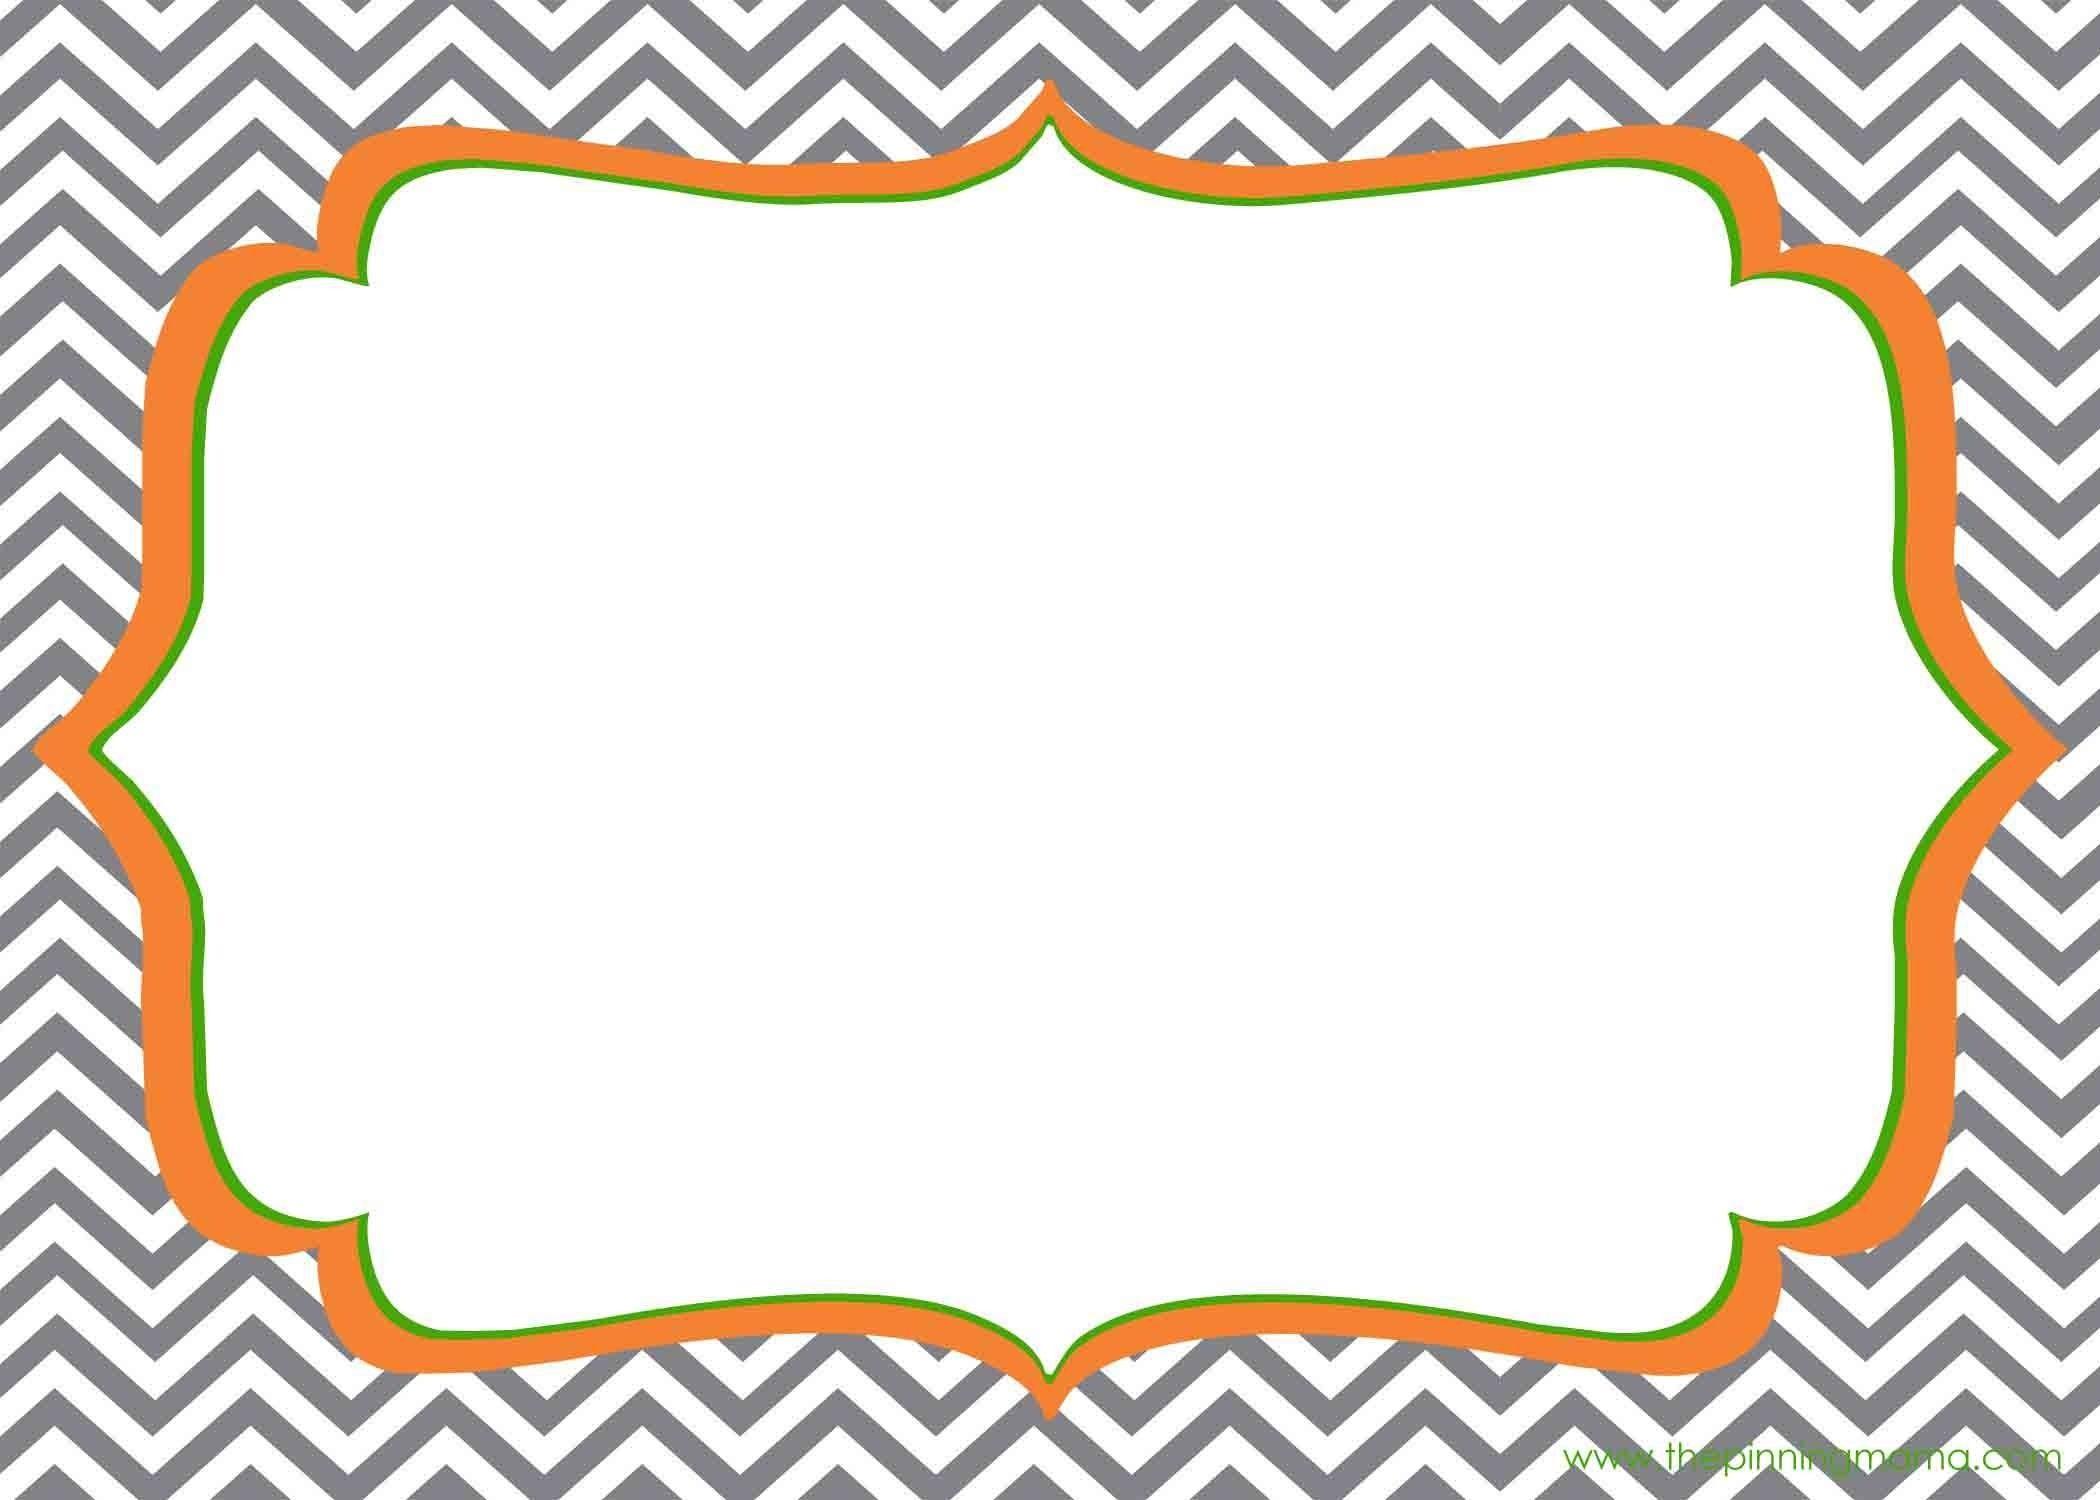 Free Printable Baby Cards Templates Printable Cards - Free Printable Baby Cards